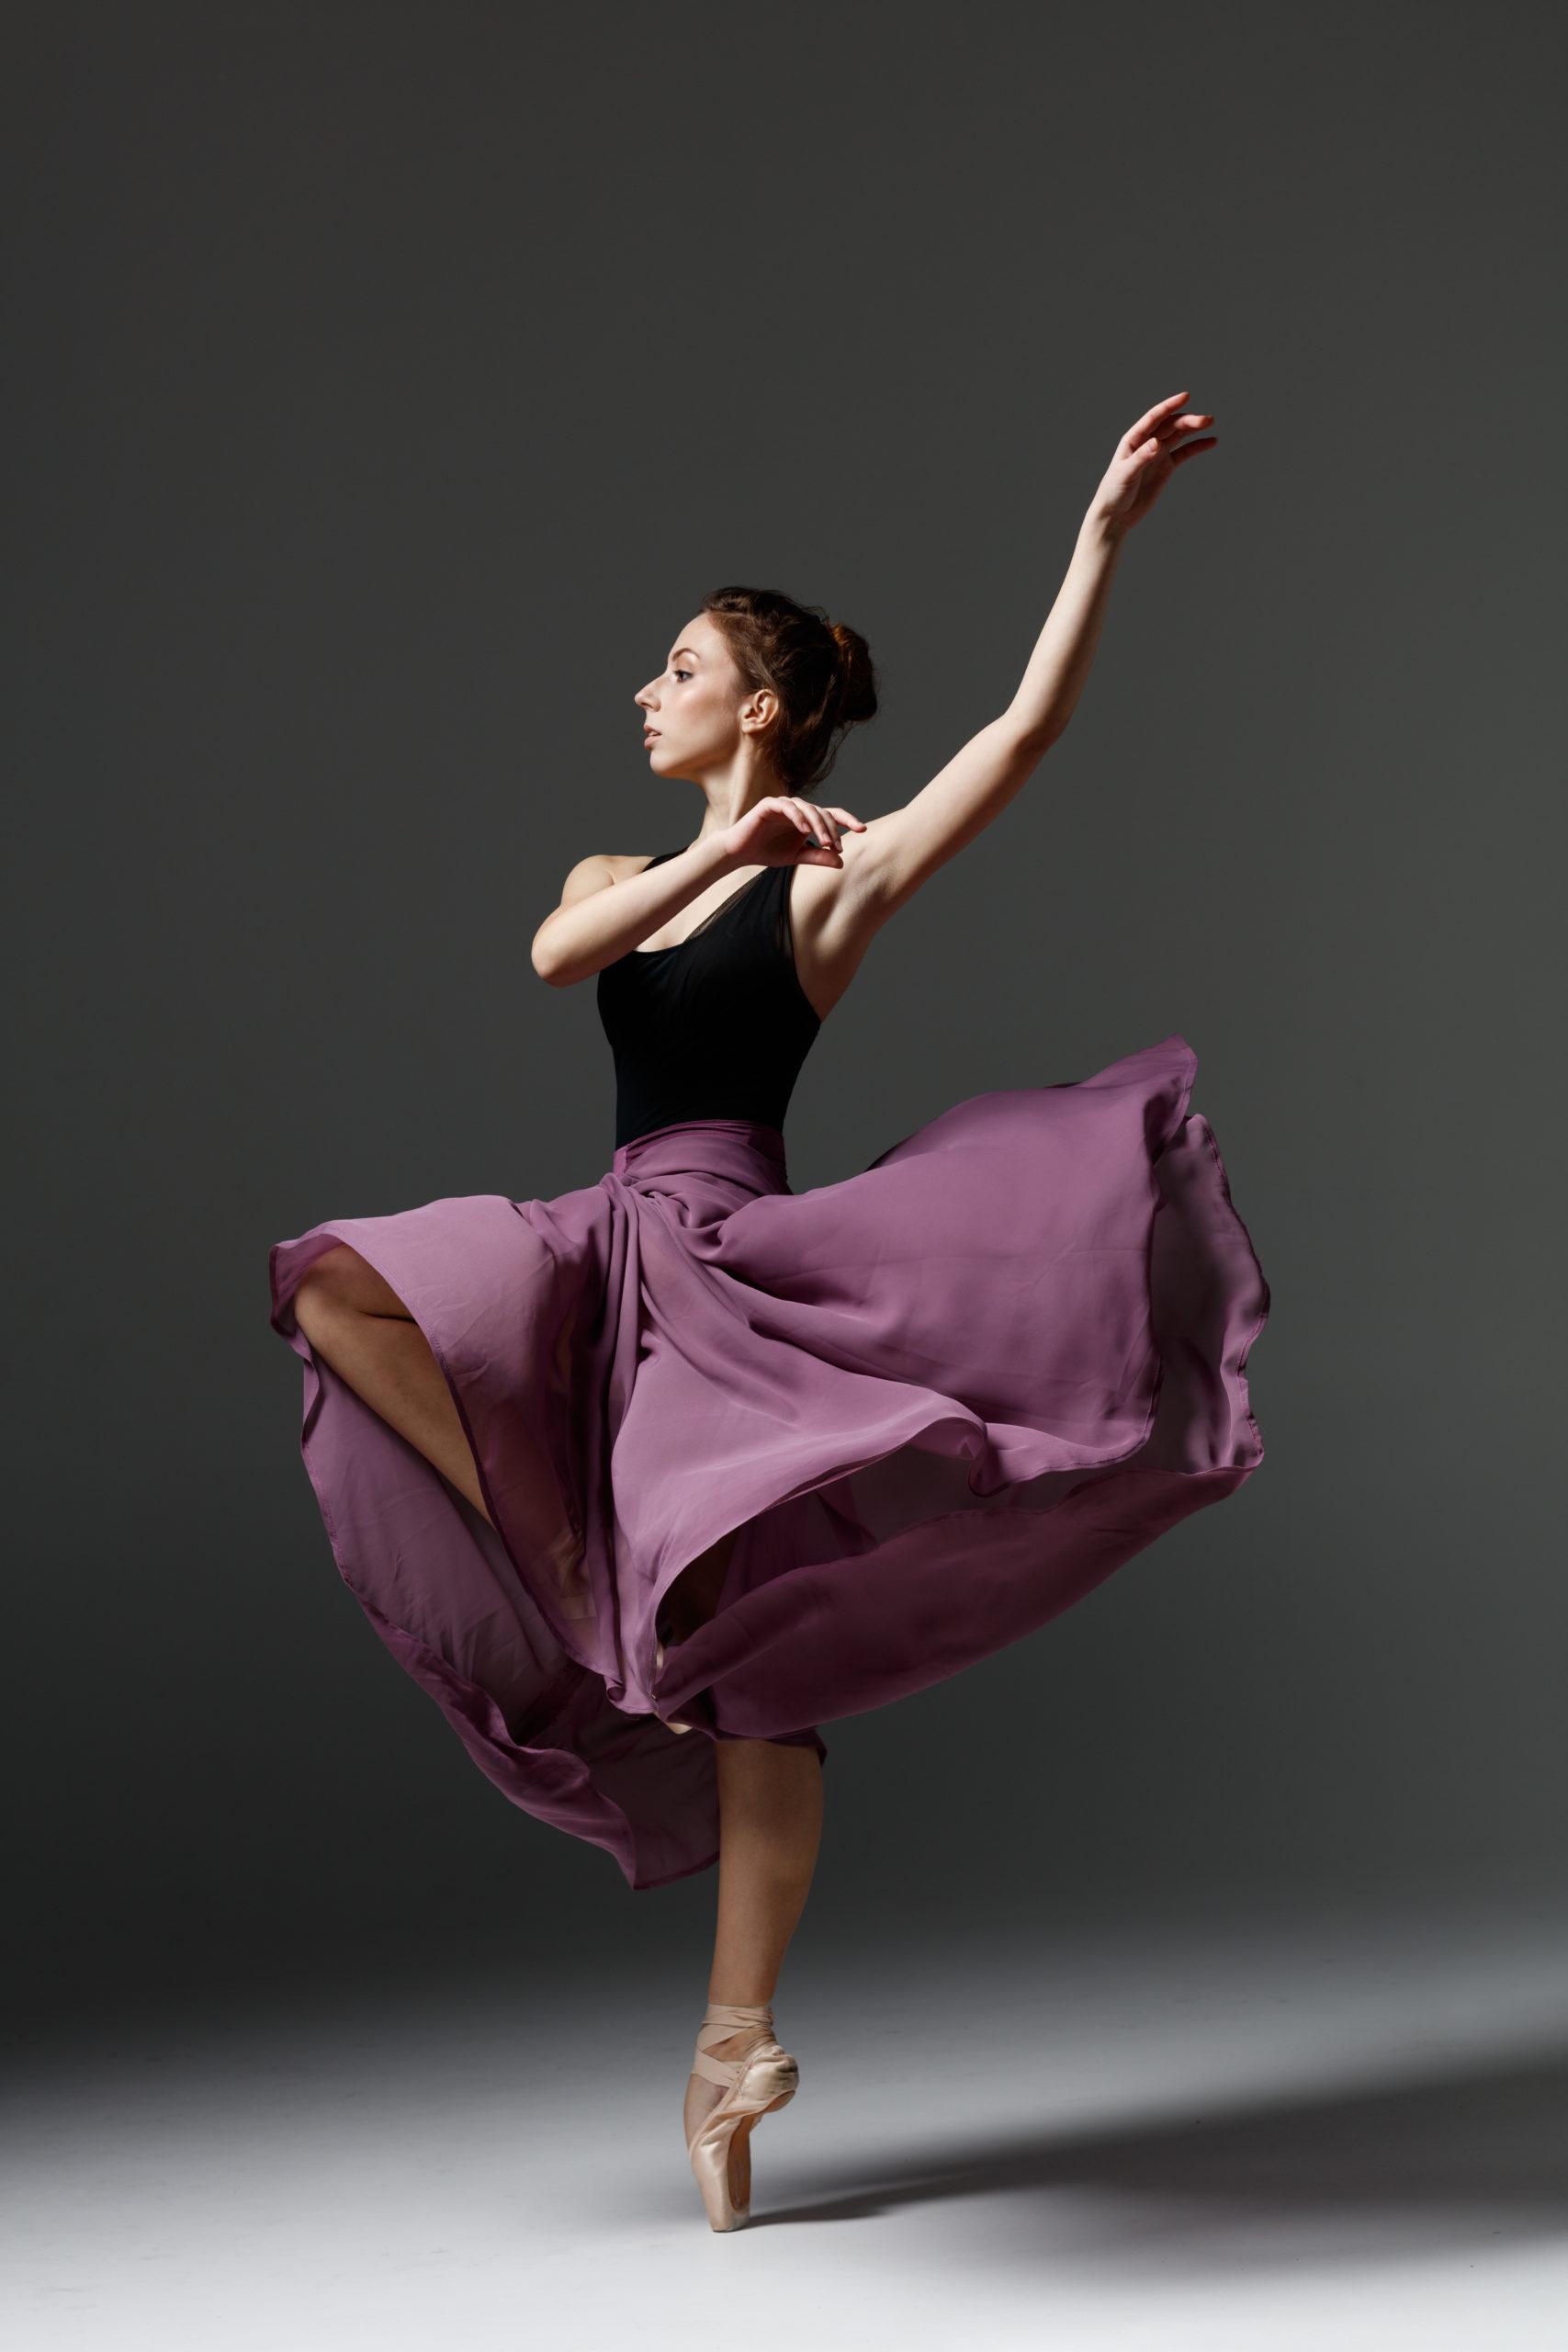 Young beautiful ballerina is posing in studio @ ayakovlev_com